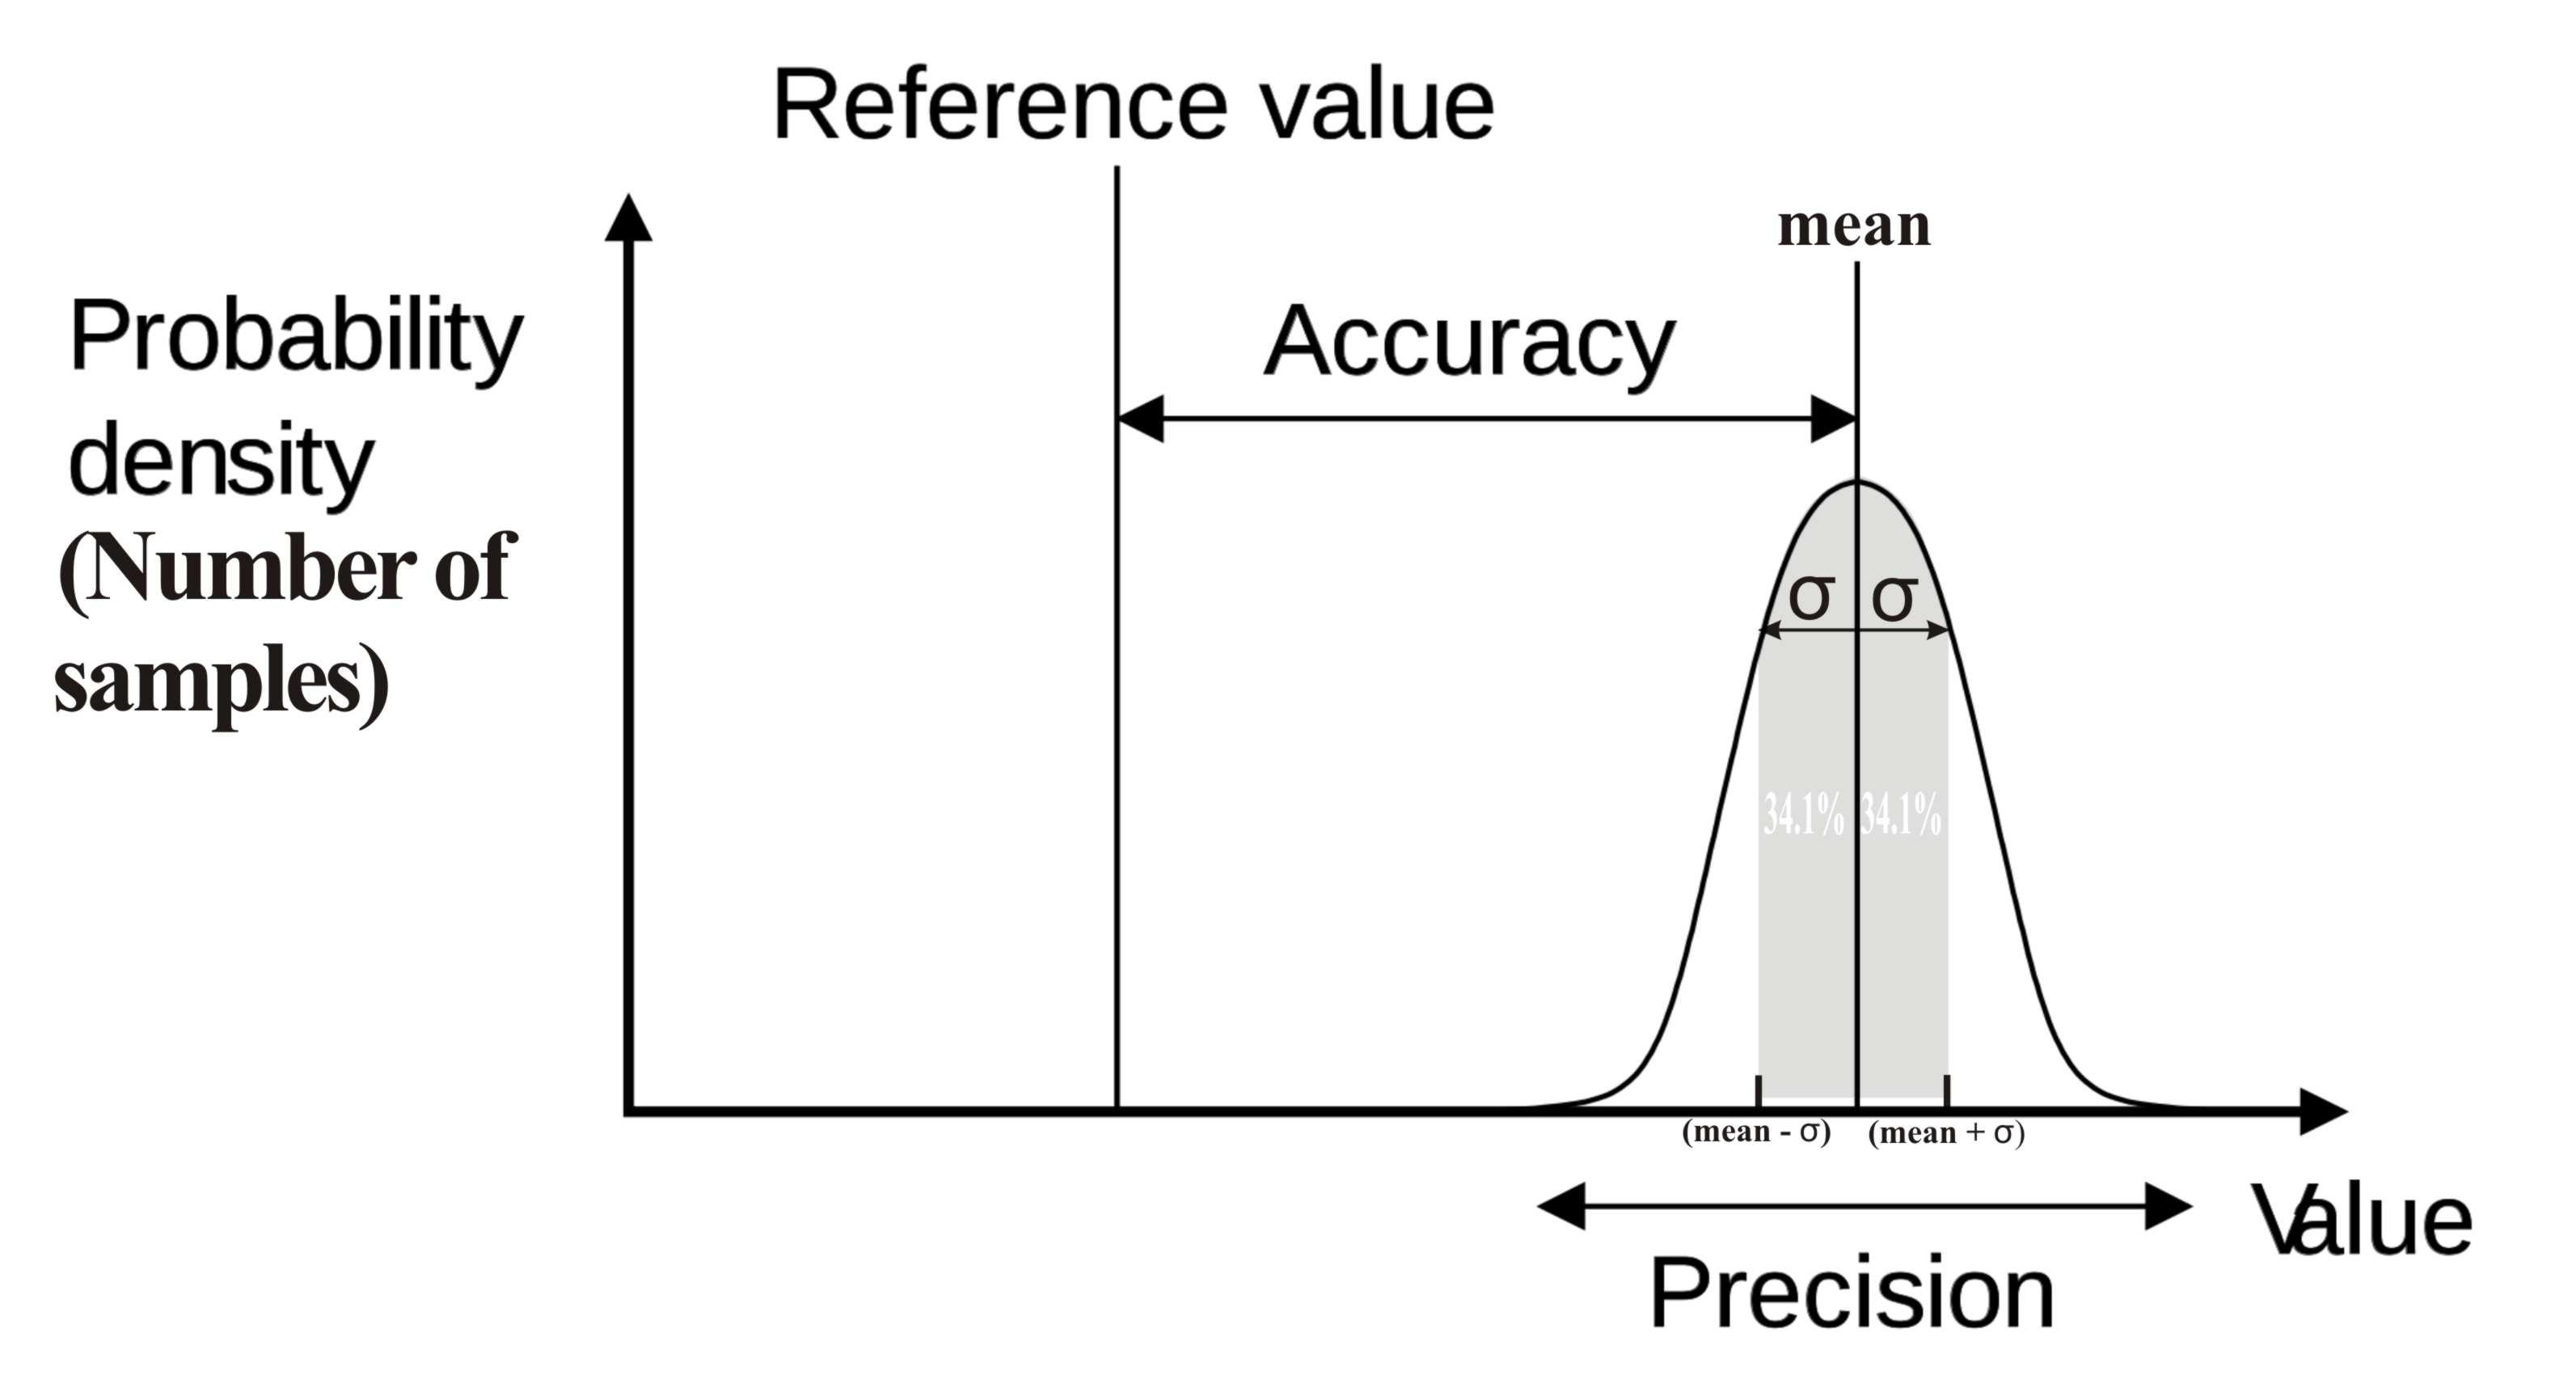 figures/misc/accuracyPrecision.jpg